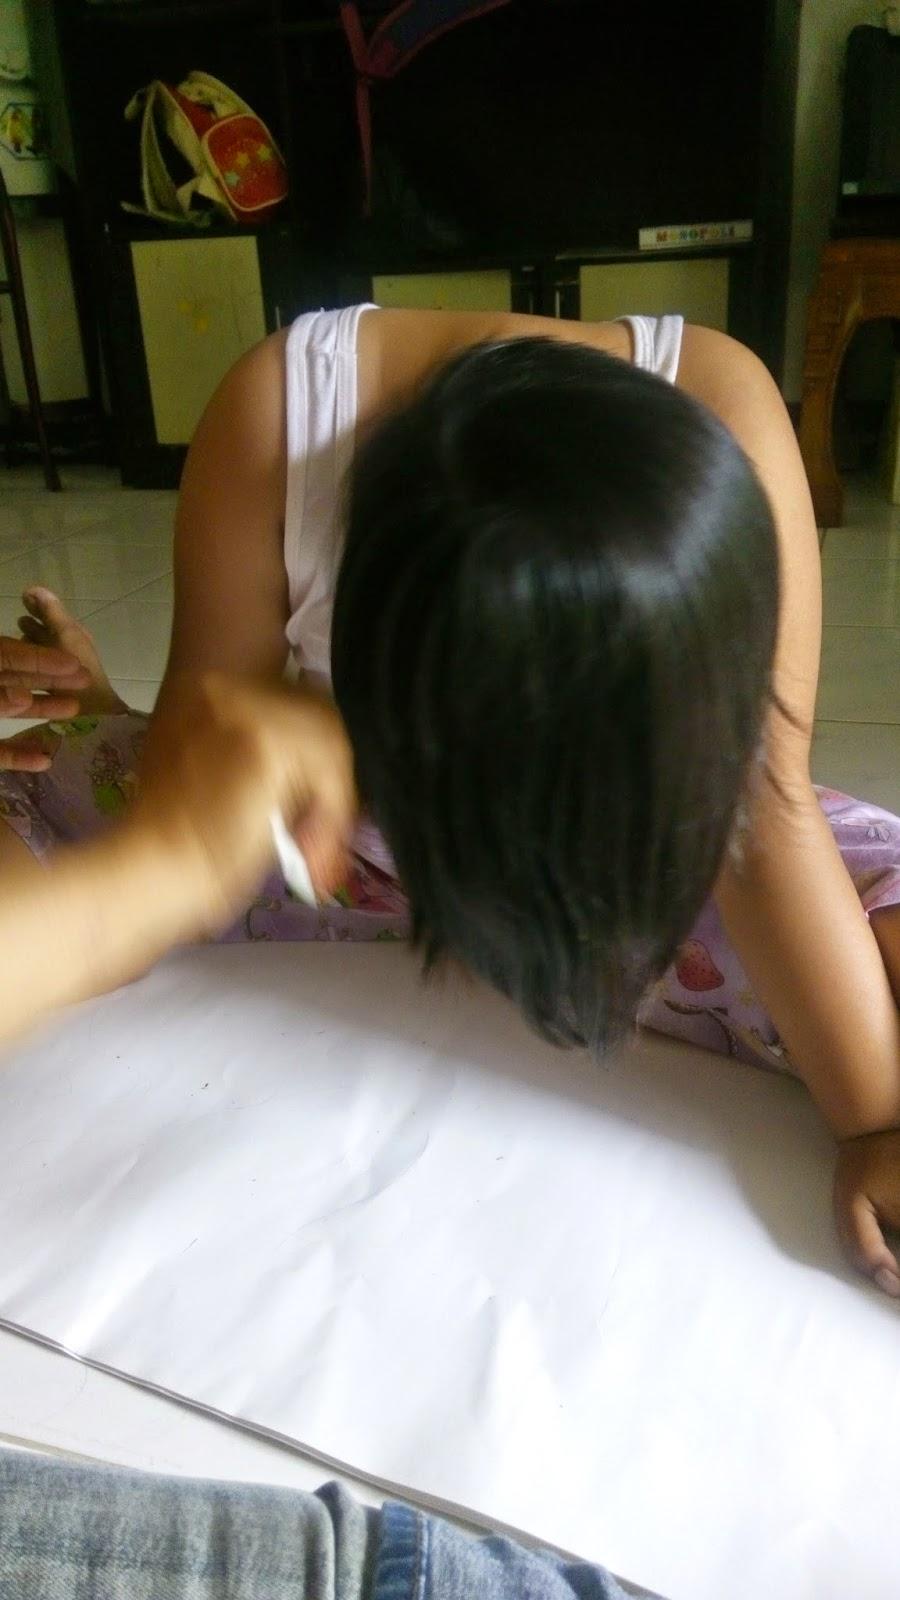 tips jitu membasmi kutu rambut, cara praktis mengusir kutu rambut